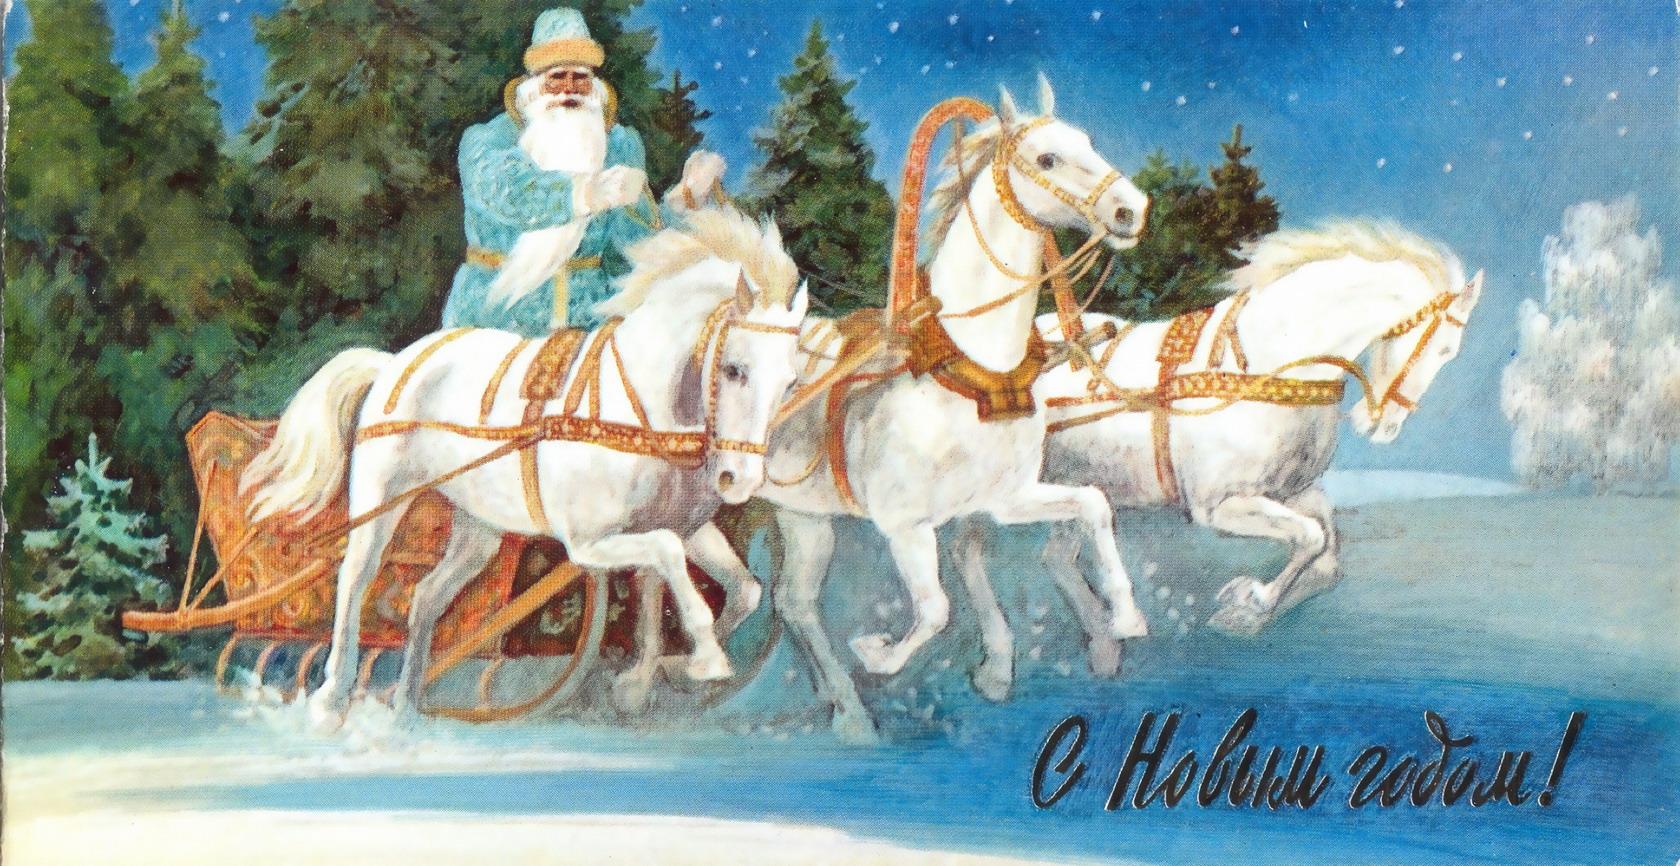 Картинка дед мороз на тройке белых лошадей